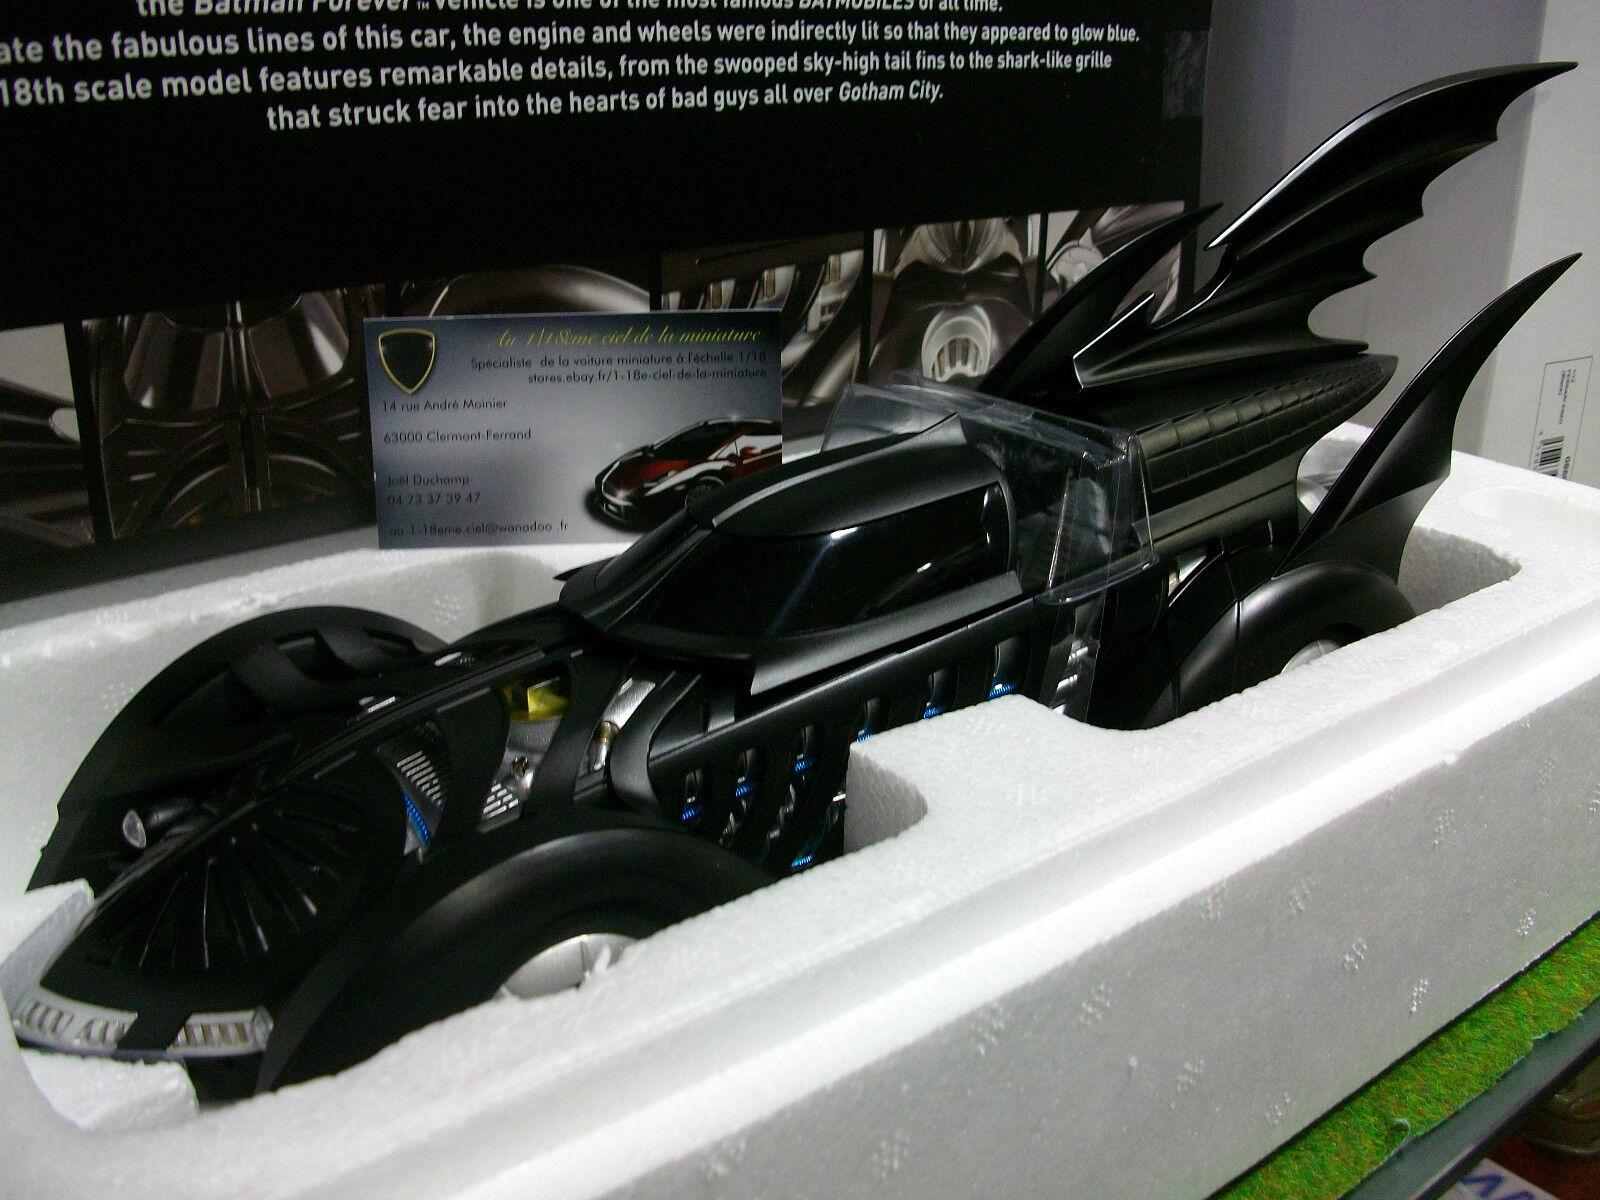 BATMOBILE BATMAN FOREVER 1995 noir 1 18 HOT WHEELS ELITE BCJ98 voiture miniature